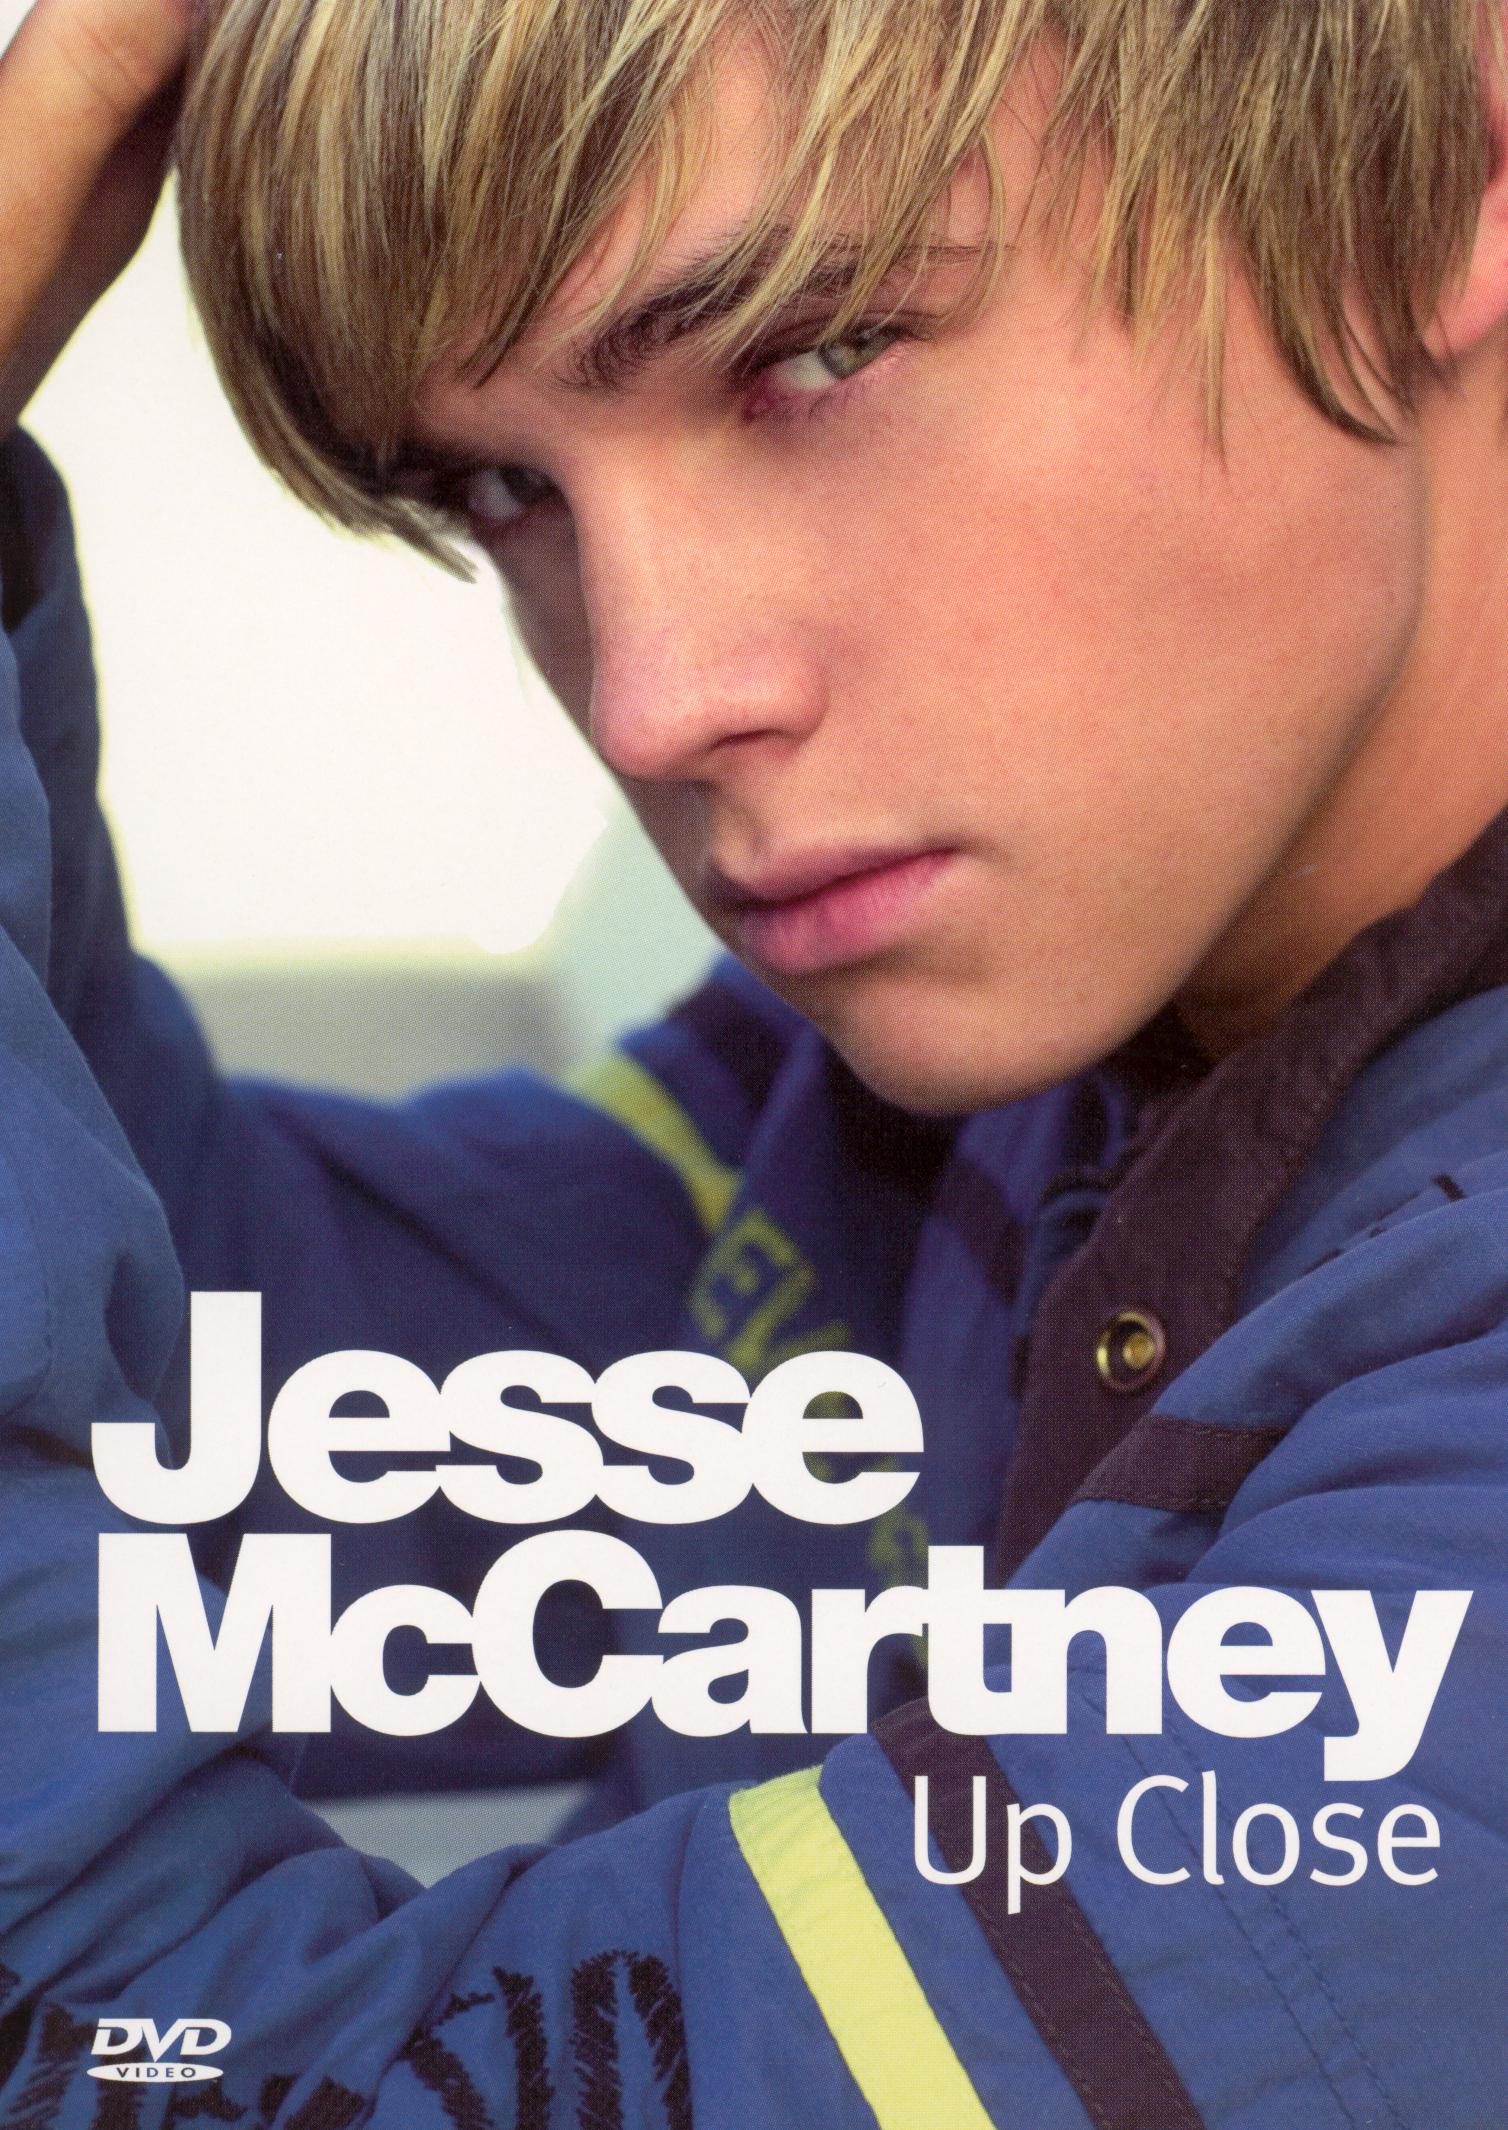 Jesse McCartney: Up Close